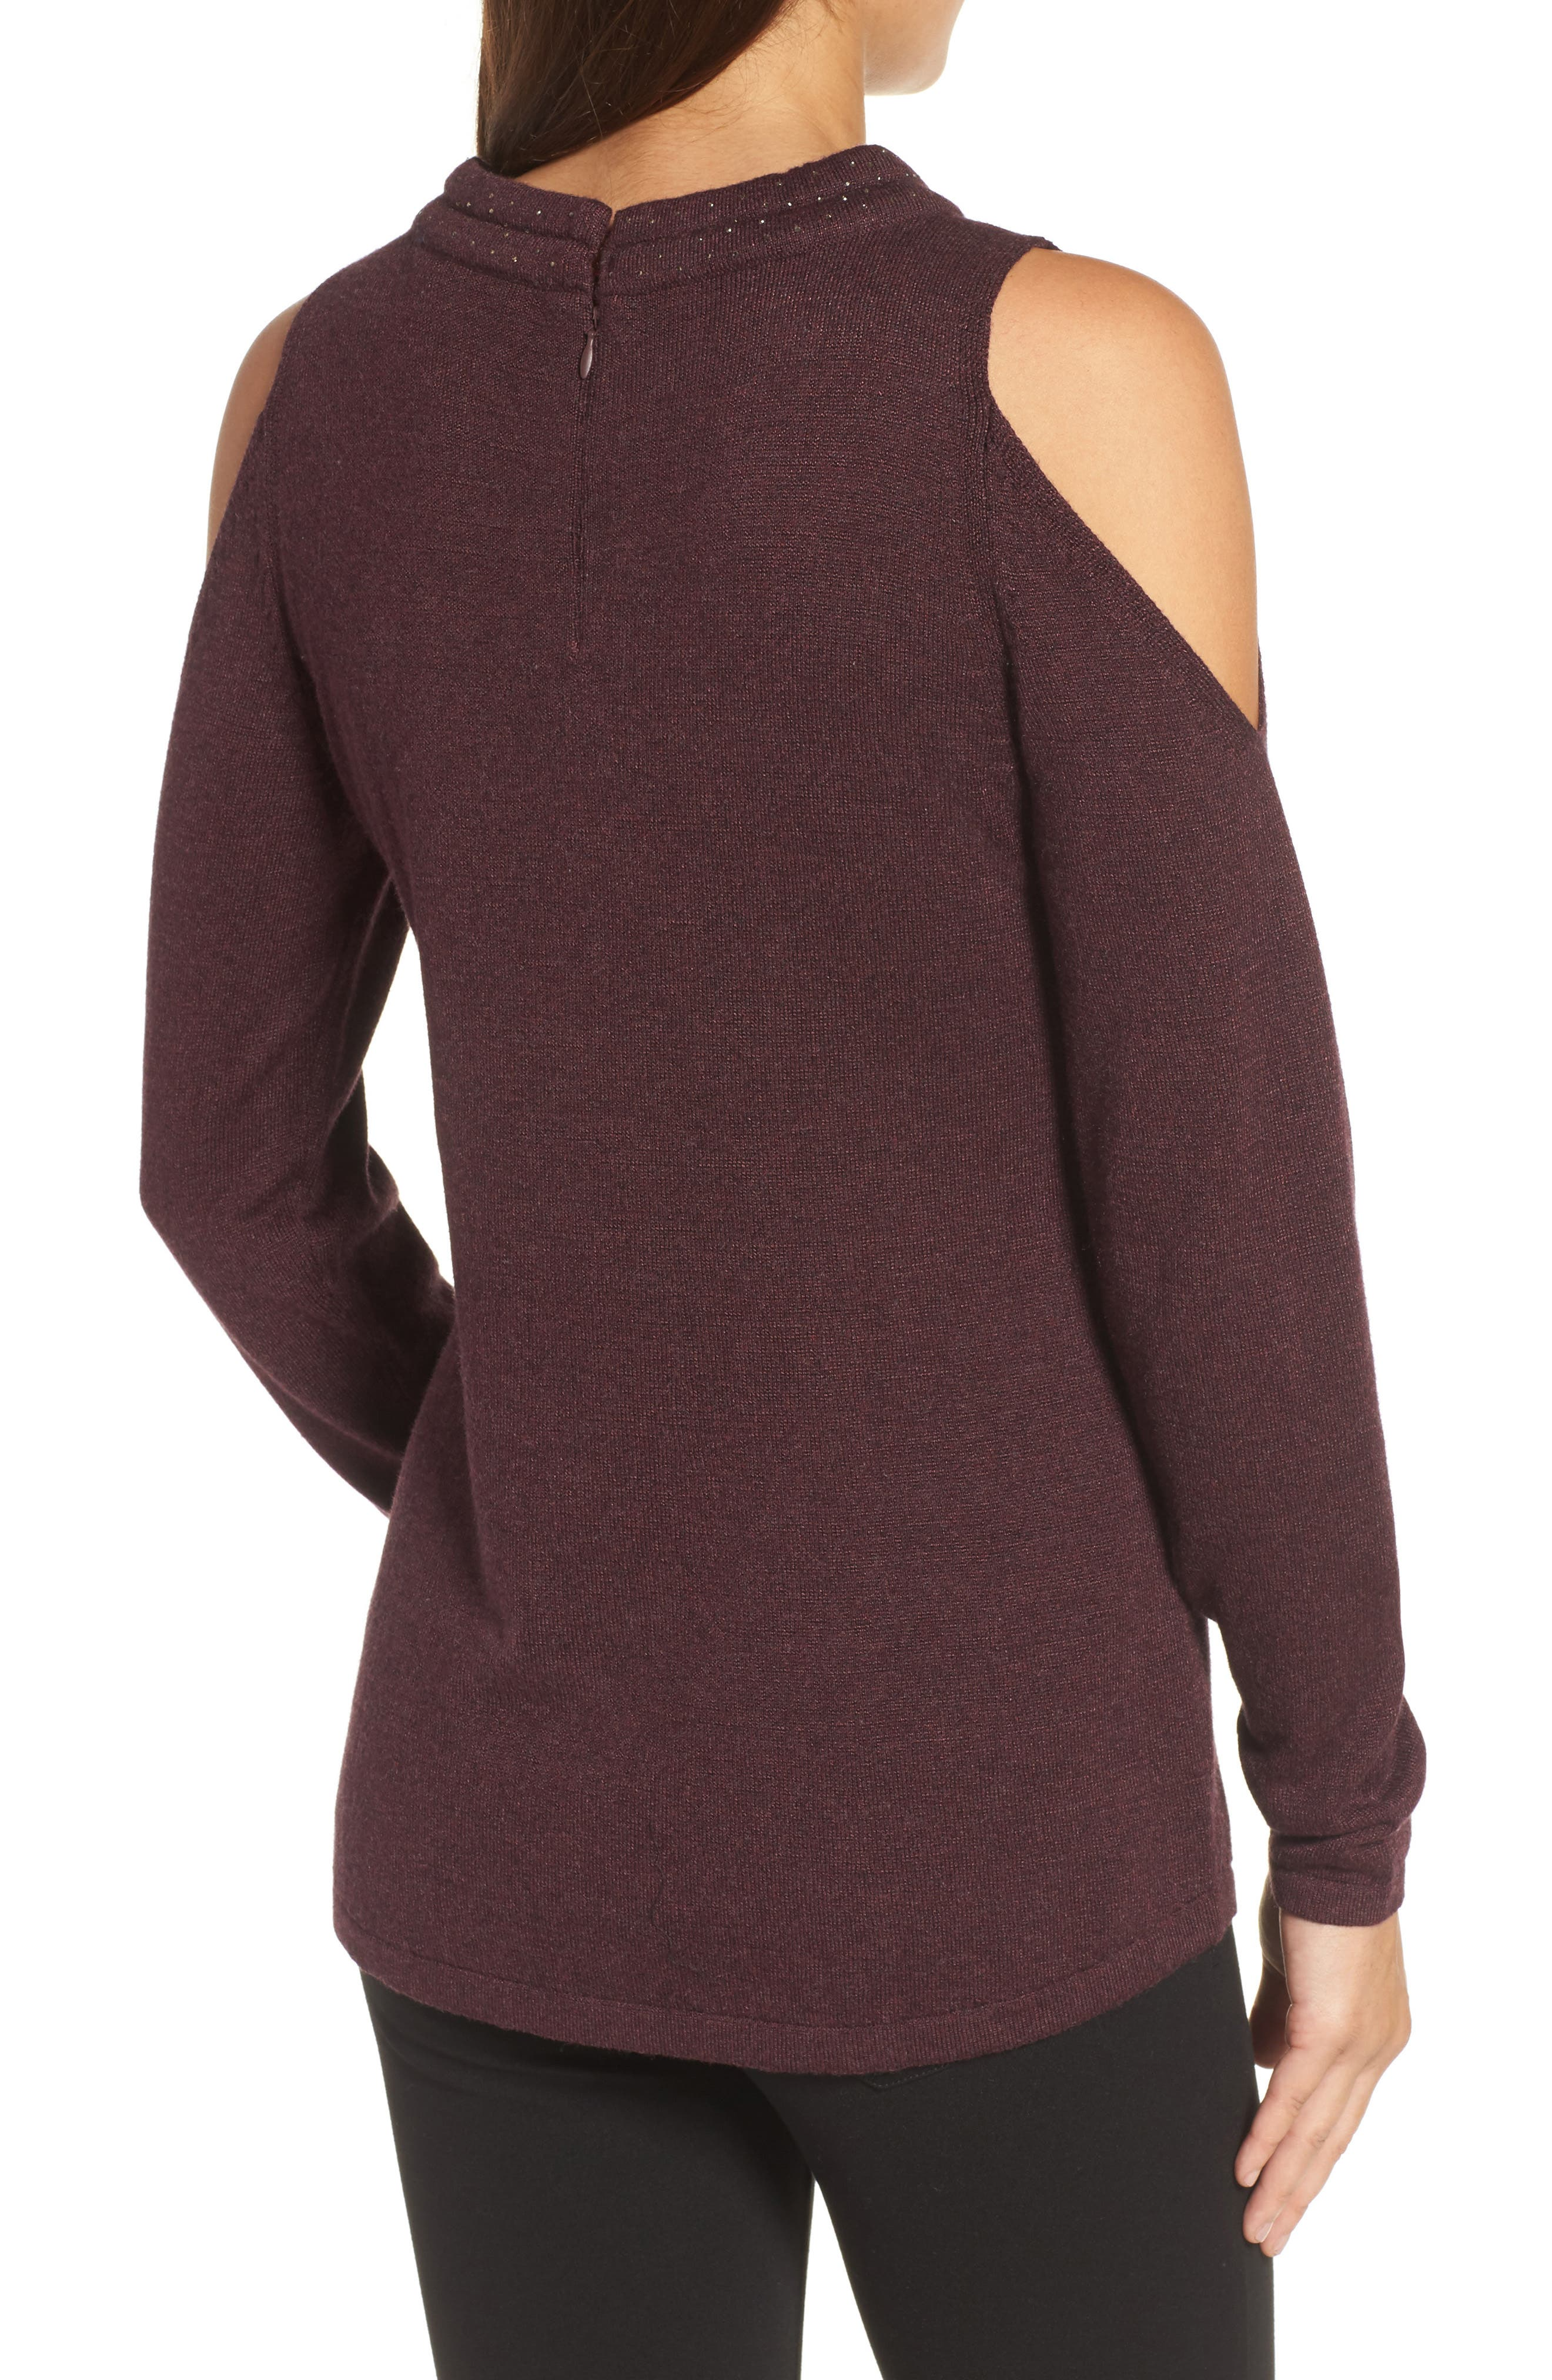 Alternate Image 2  - NIC+ZOE Jewel Neck Cold Shoulder Top (Regular & Petite)